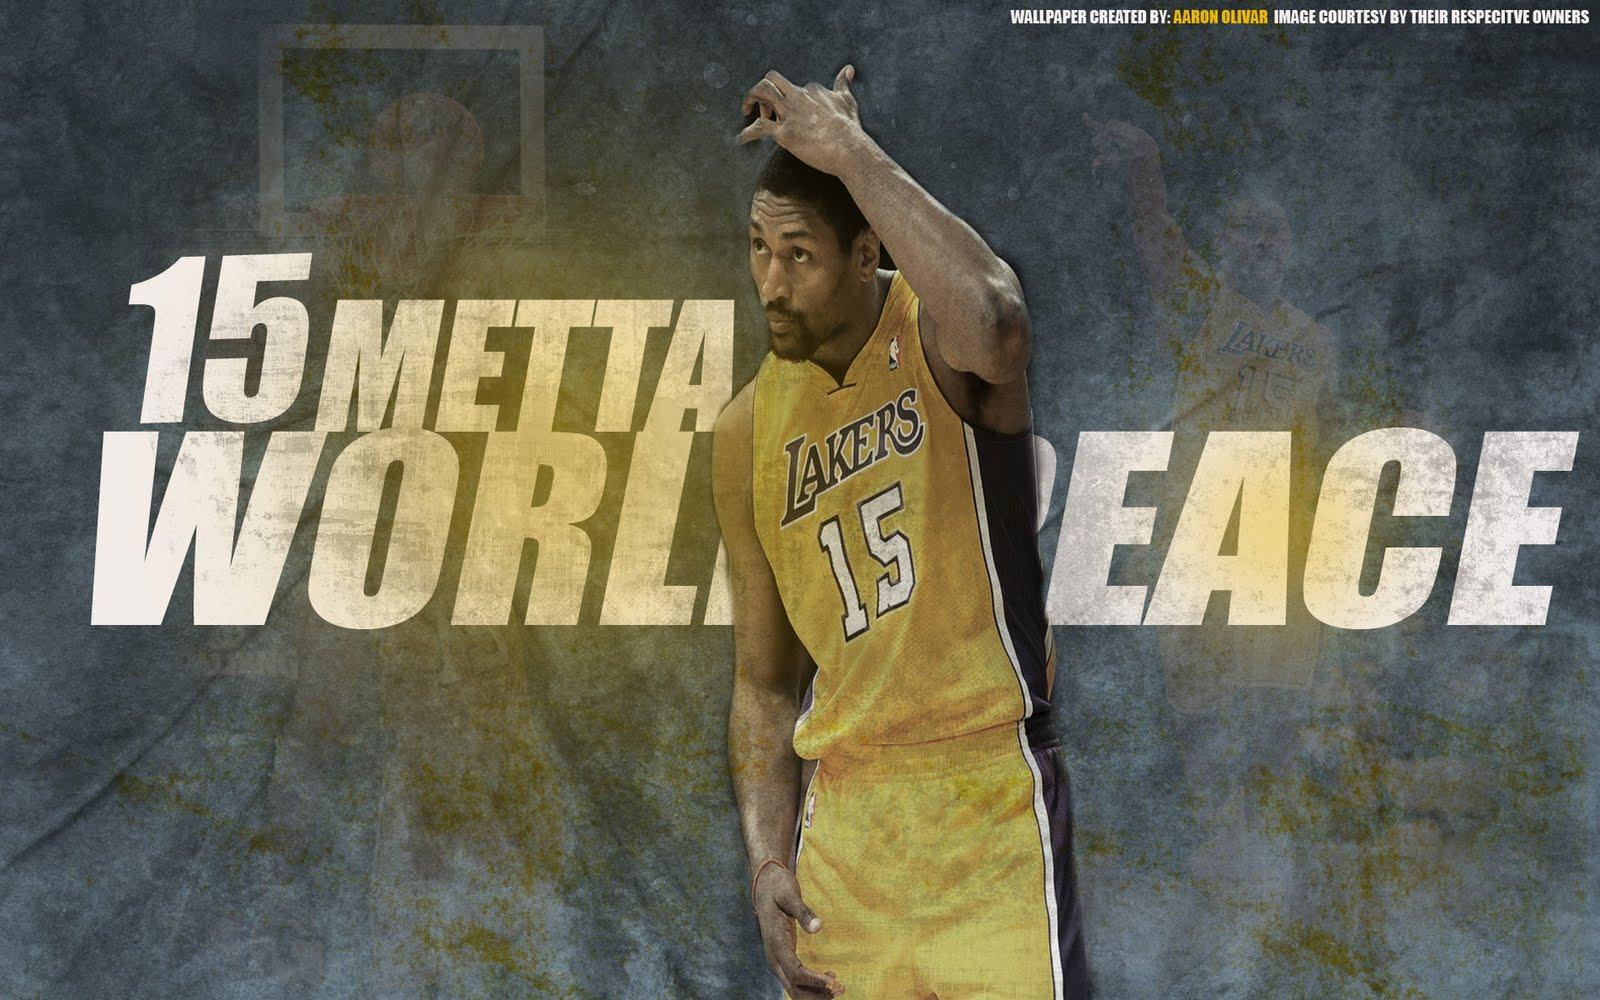 Metta World Peace Lakers 1920x1200 Wallpaper Big Fan of NBA   Daily 1600x1000